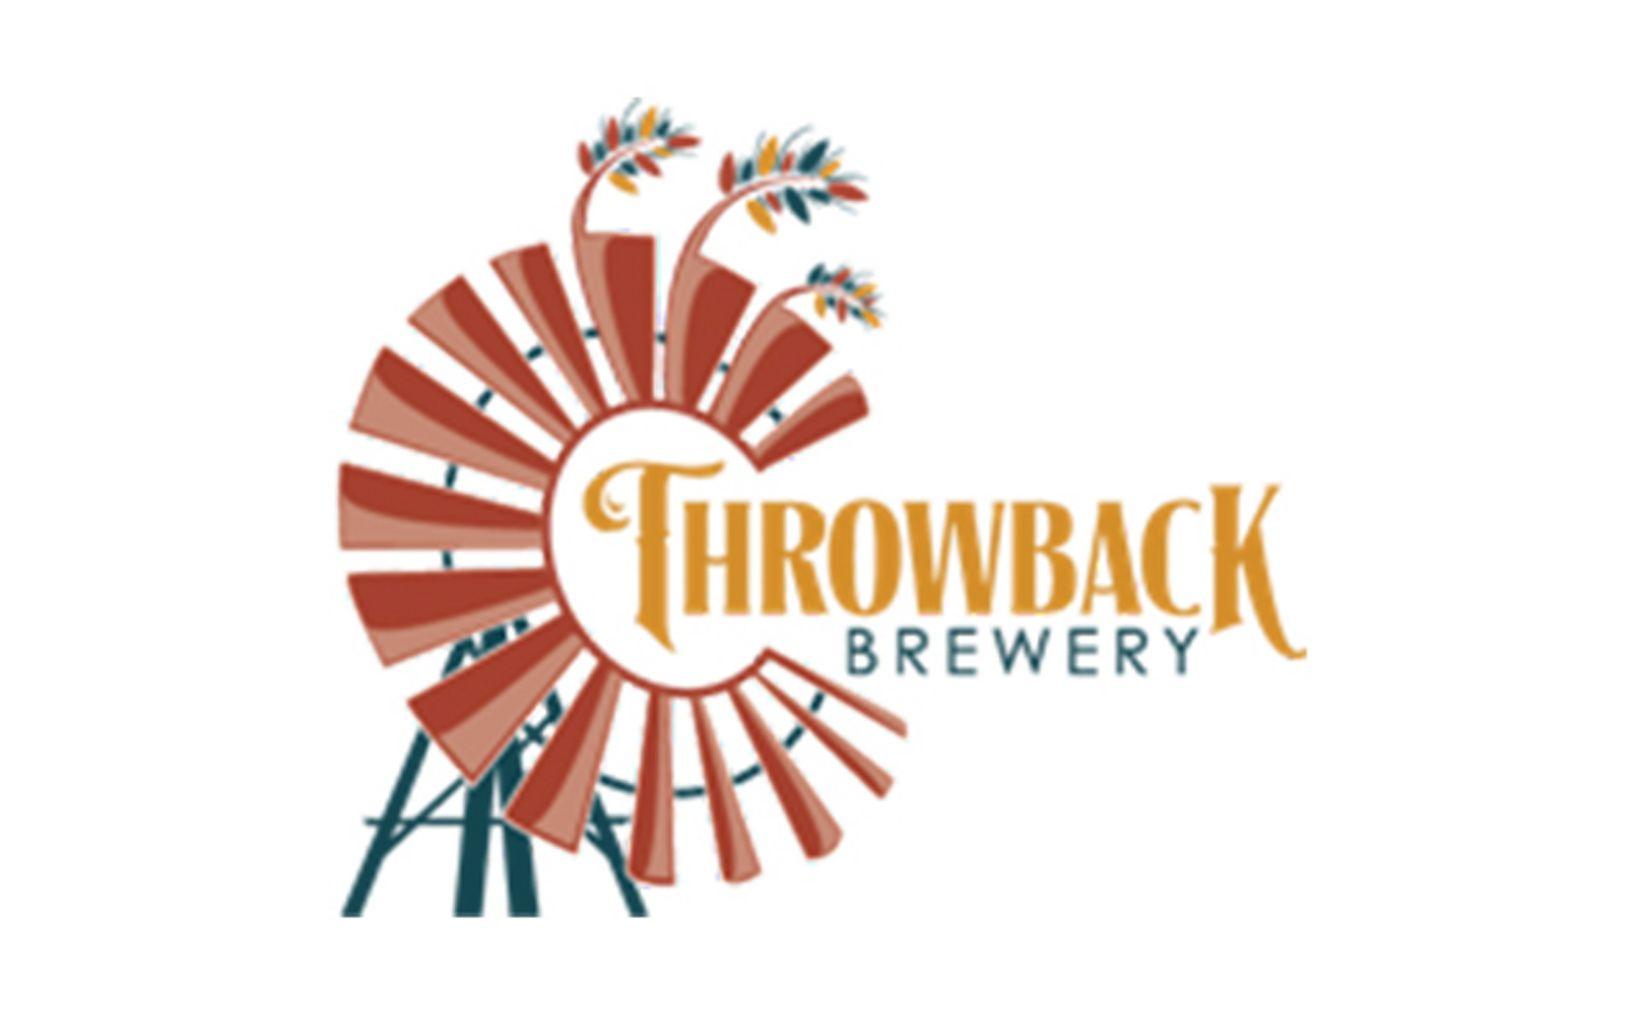 Throwback Brewery Logo.